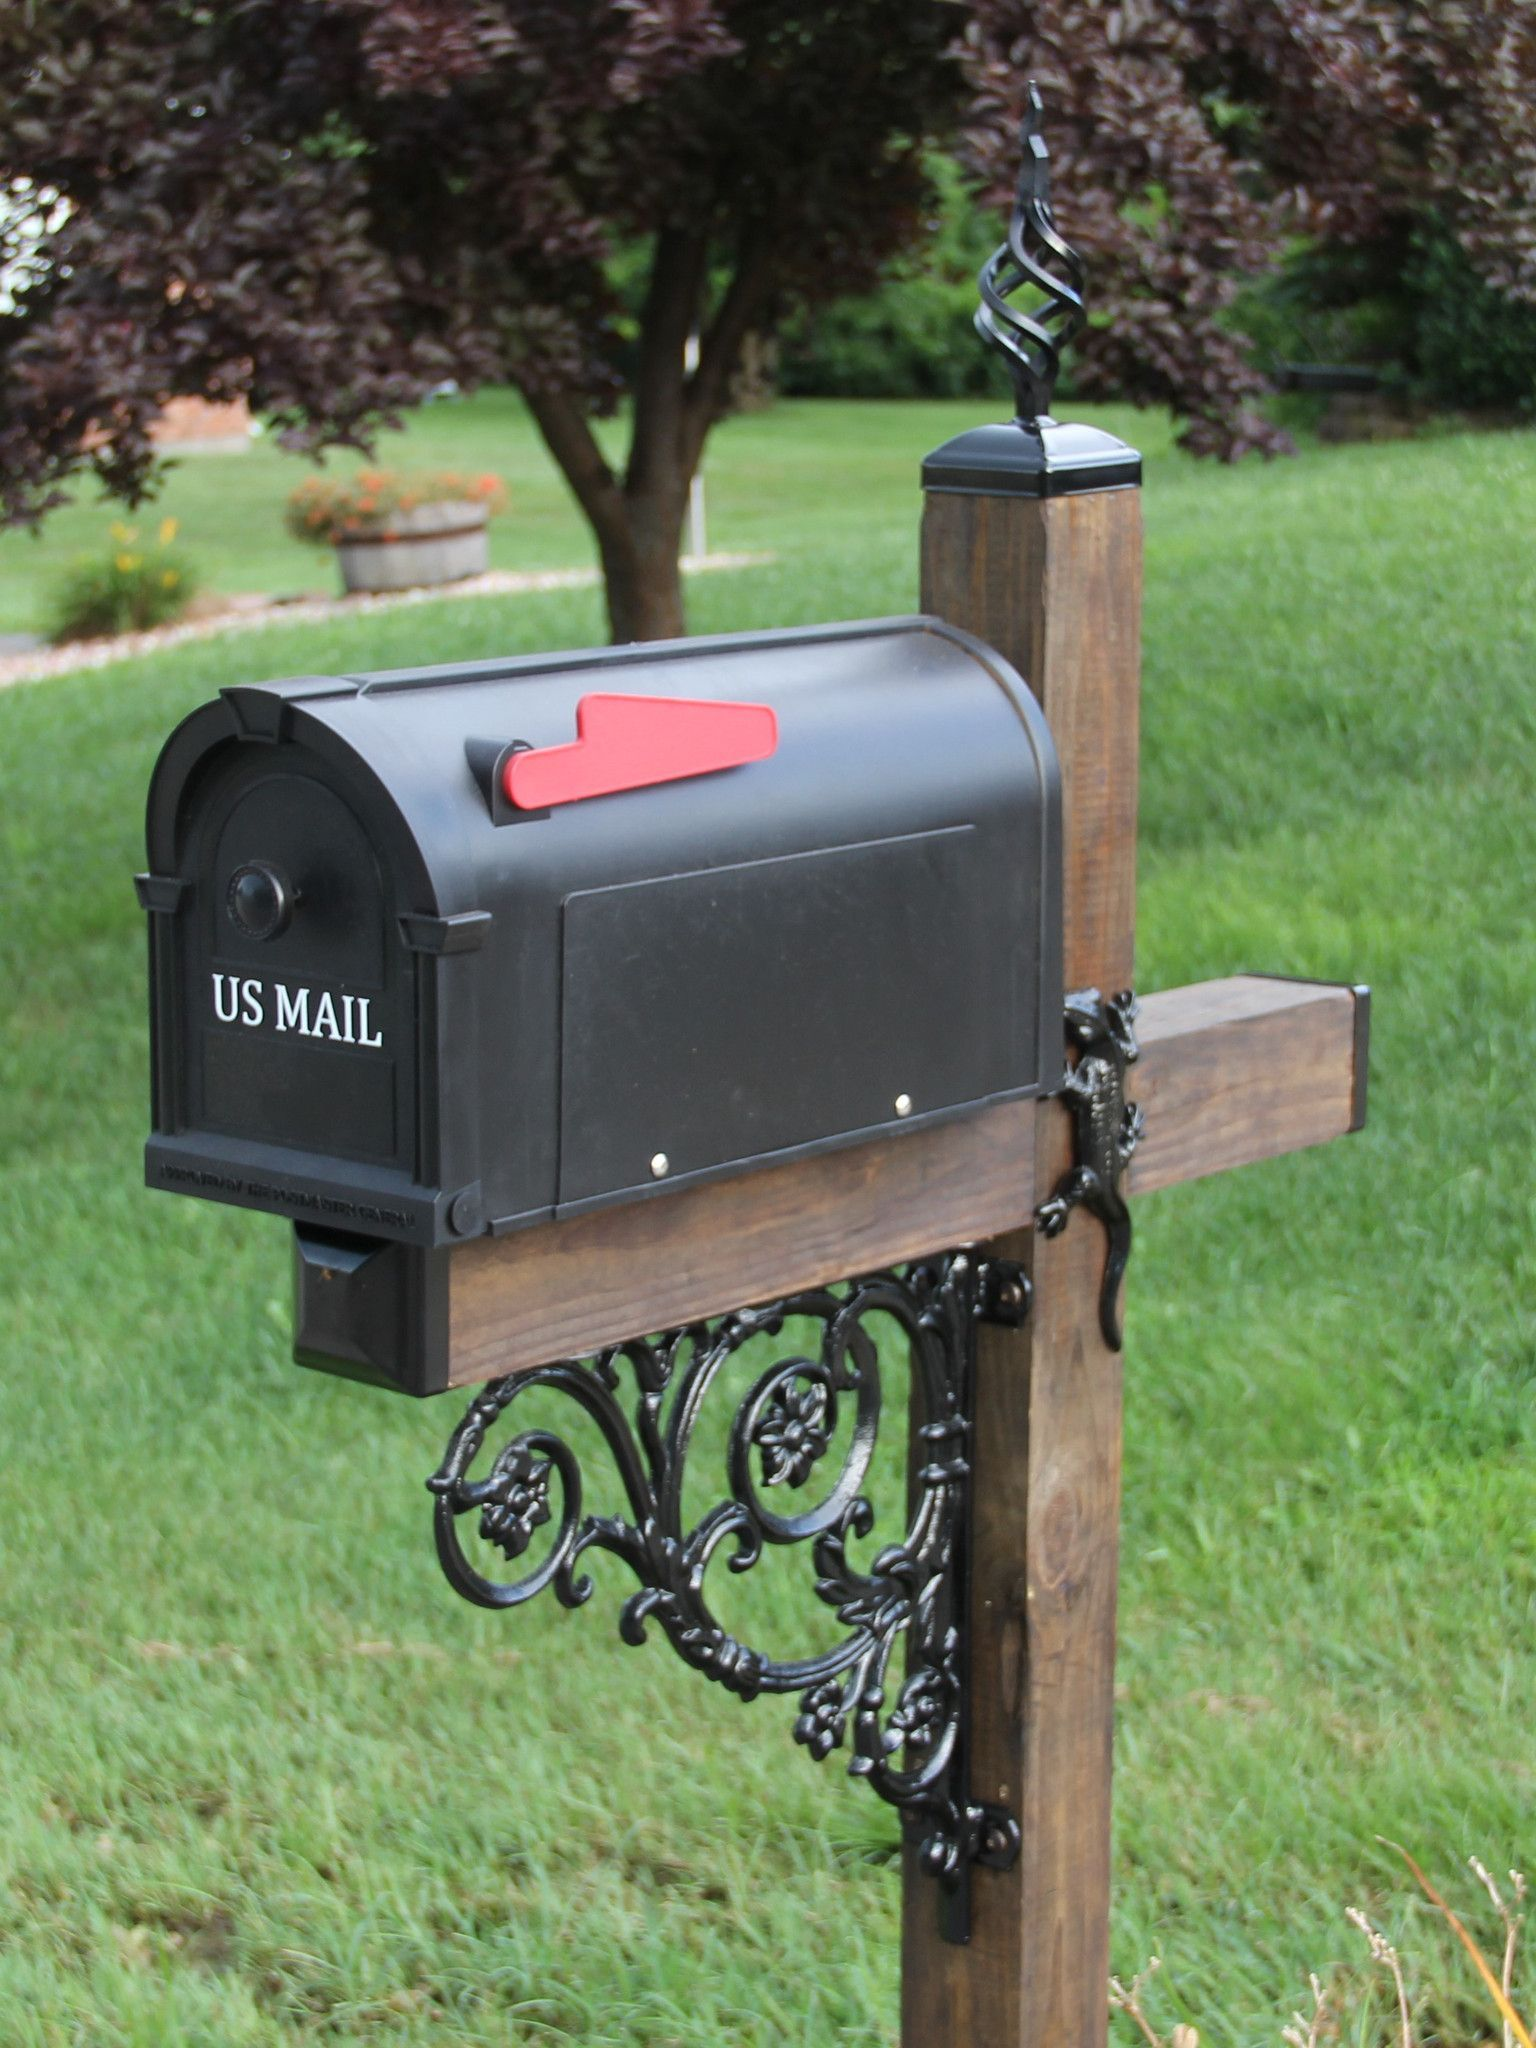 Cross Themed Wrought Iron Mailbox Post Dress Up Kit Mailbox And Post Not Included Wrought Iron Mailbox Mailbox Landscaping Mailbox Makeover